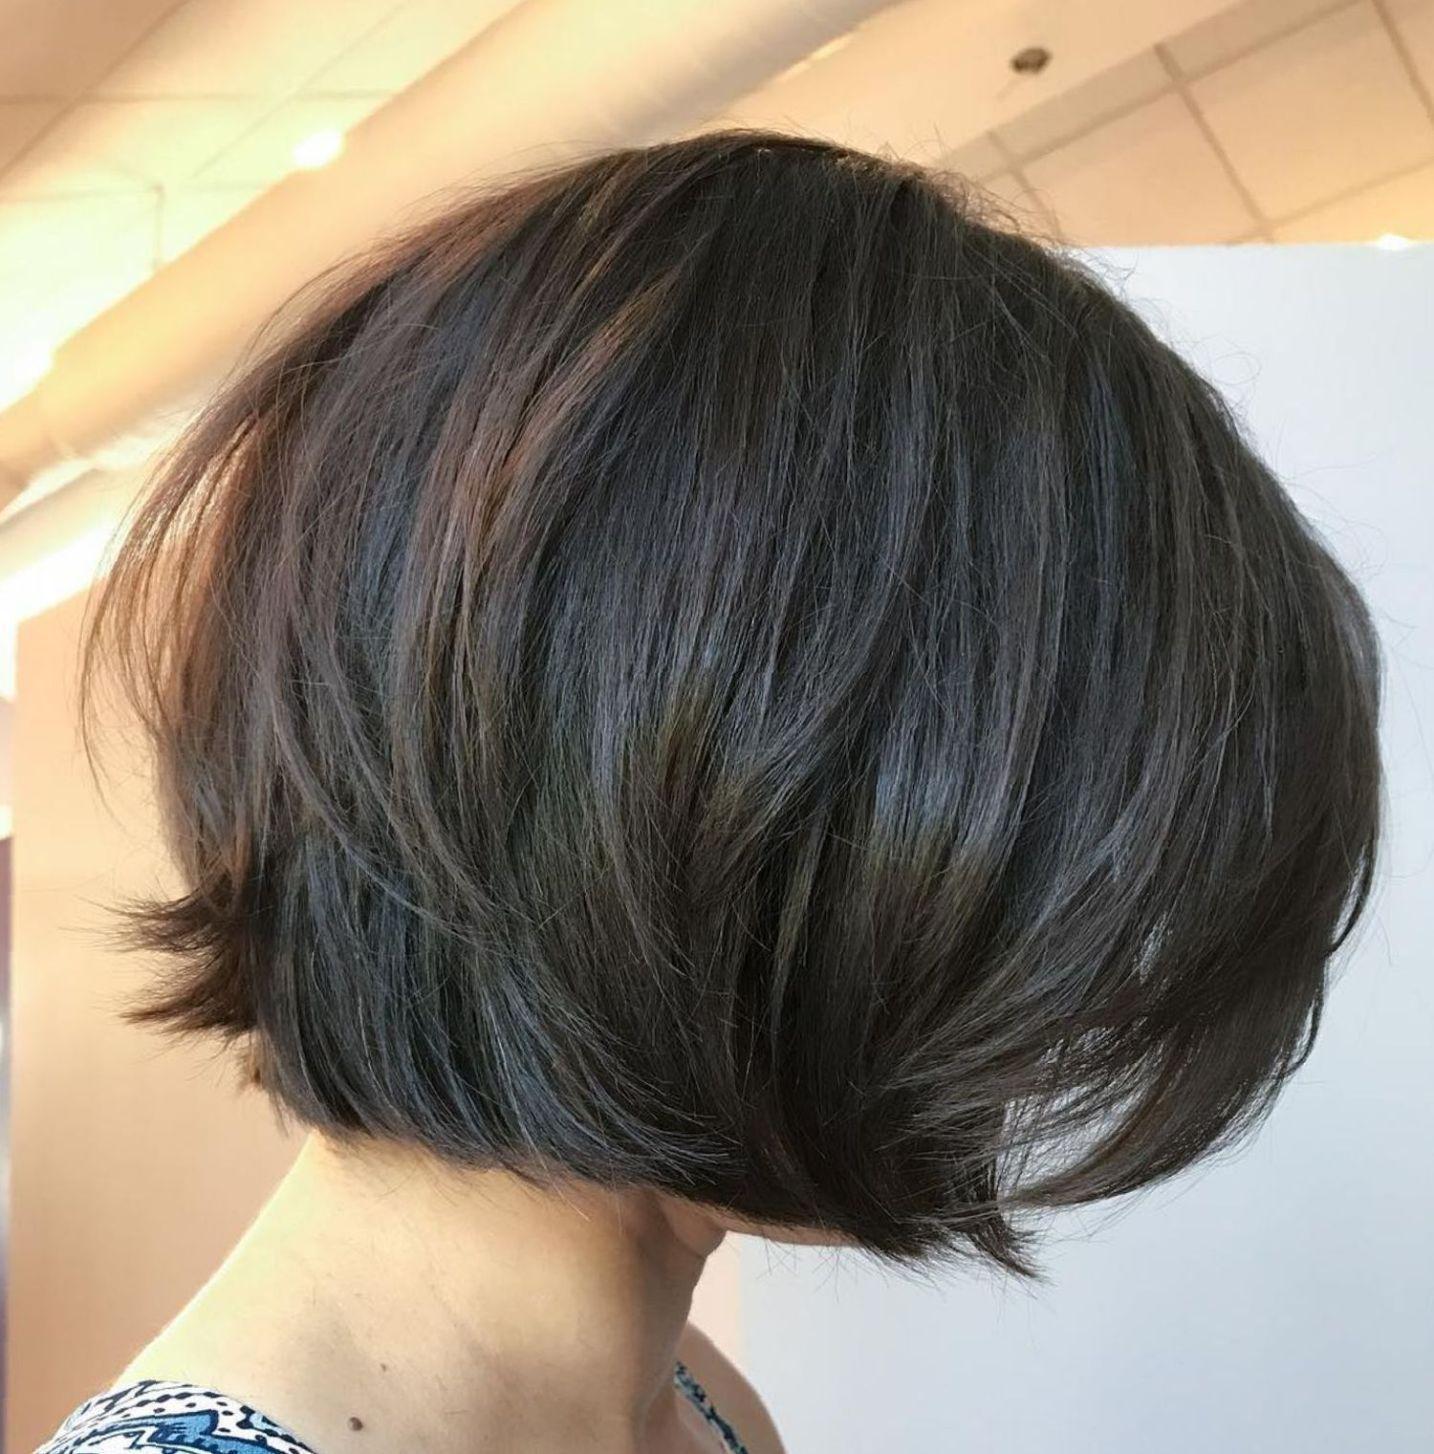 One Length Layered Brown Bob Thick Hair Styles Short Hairstyles For Thick Hair Haircut For Thick Hair